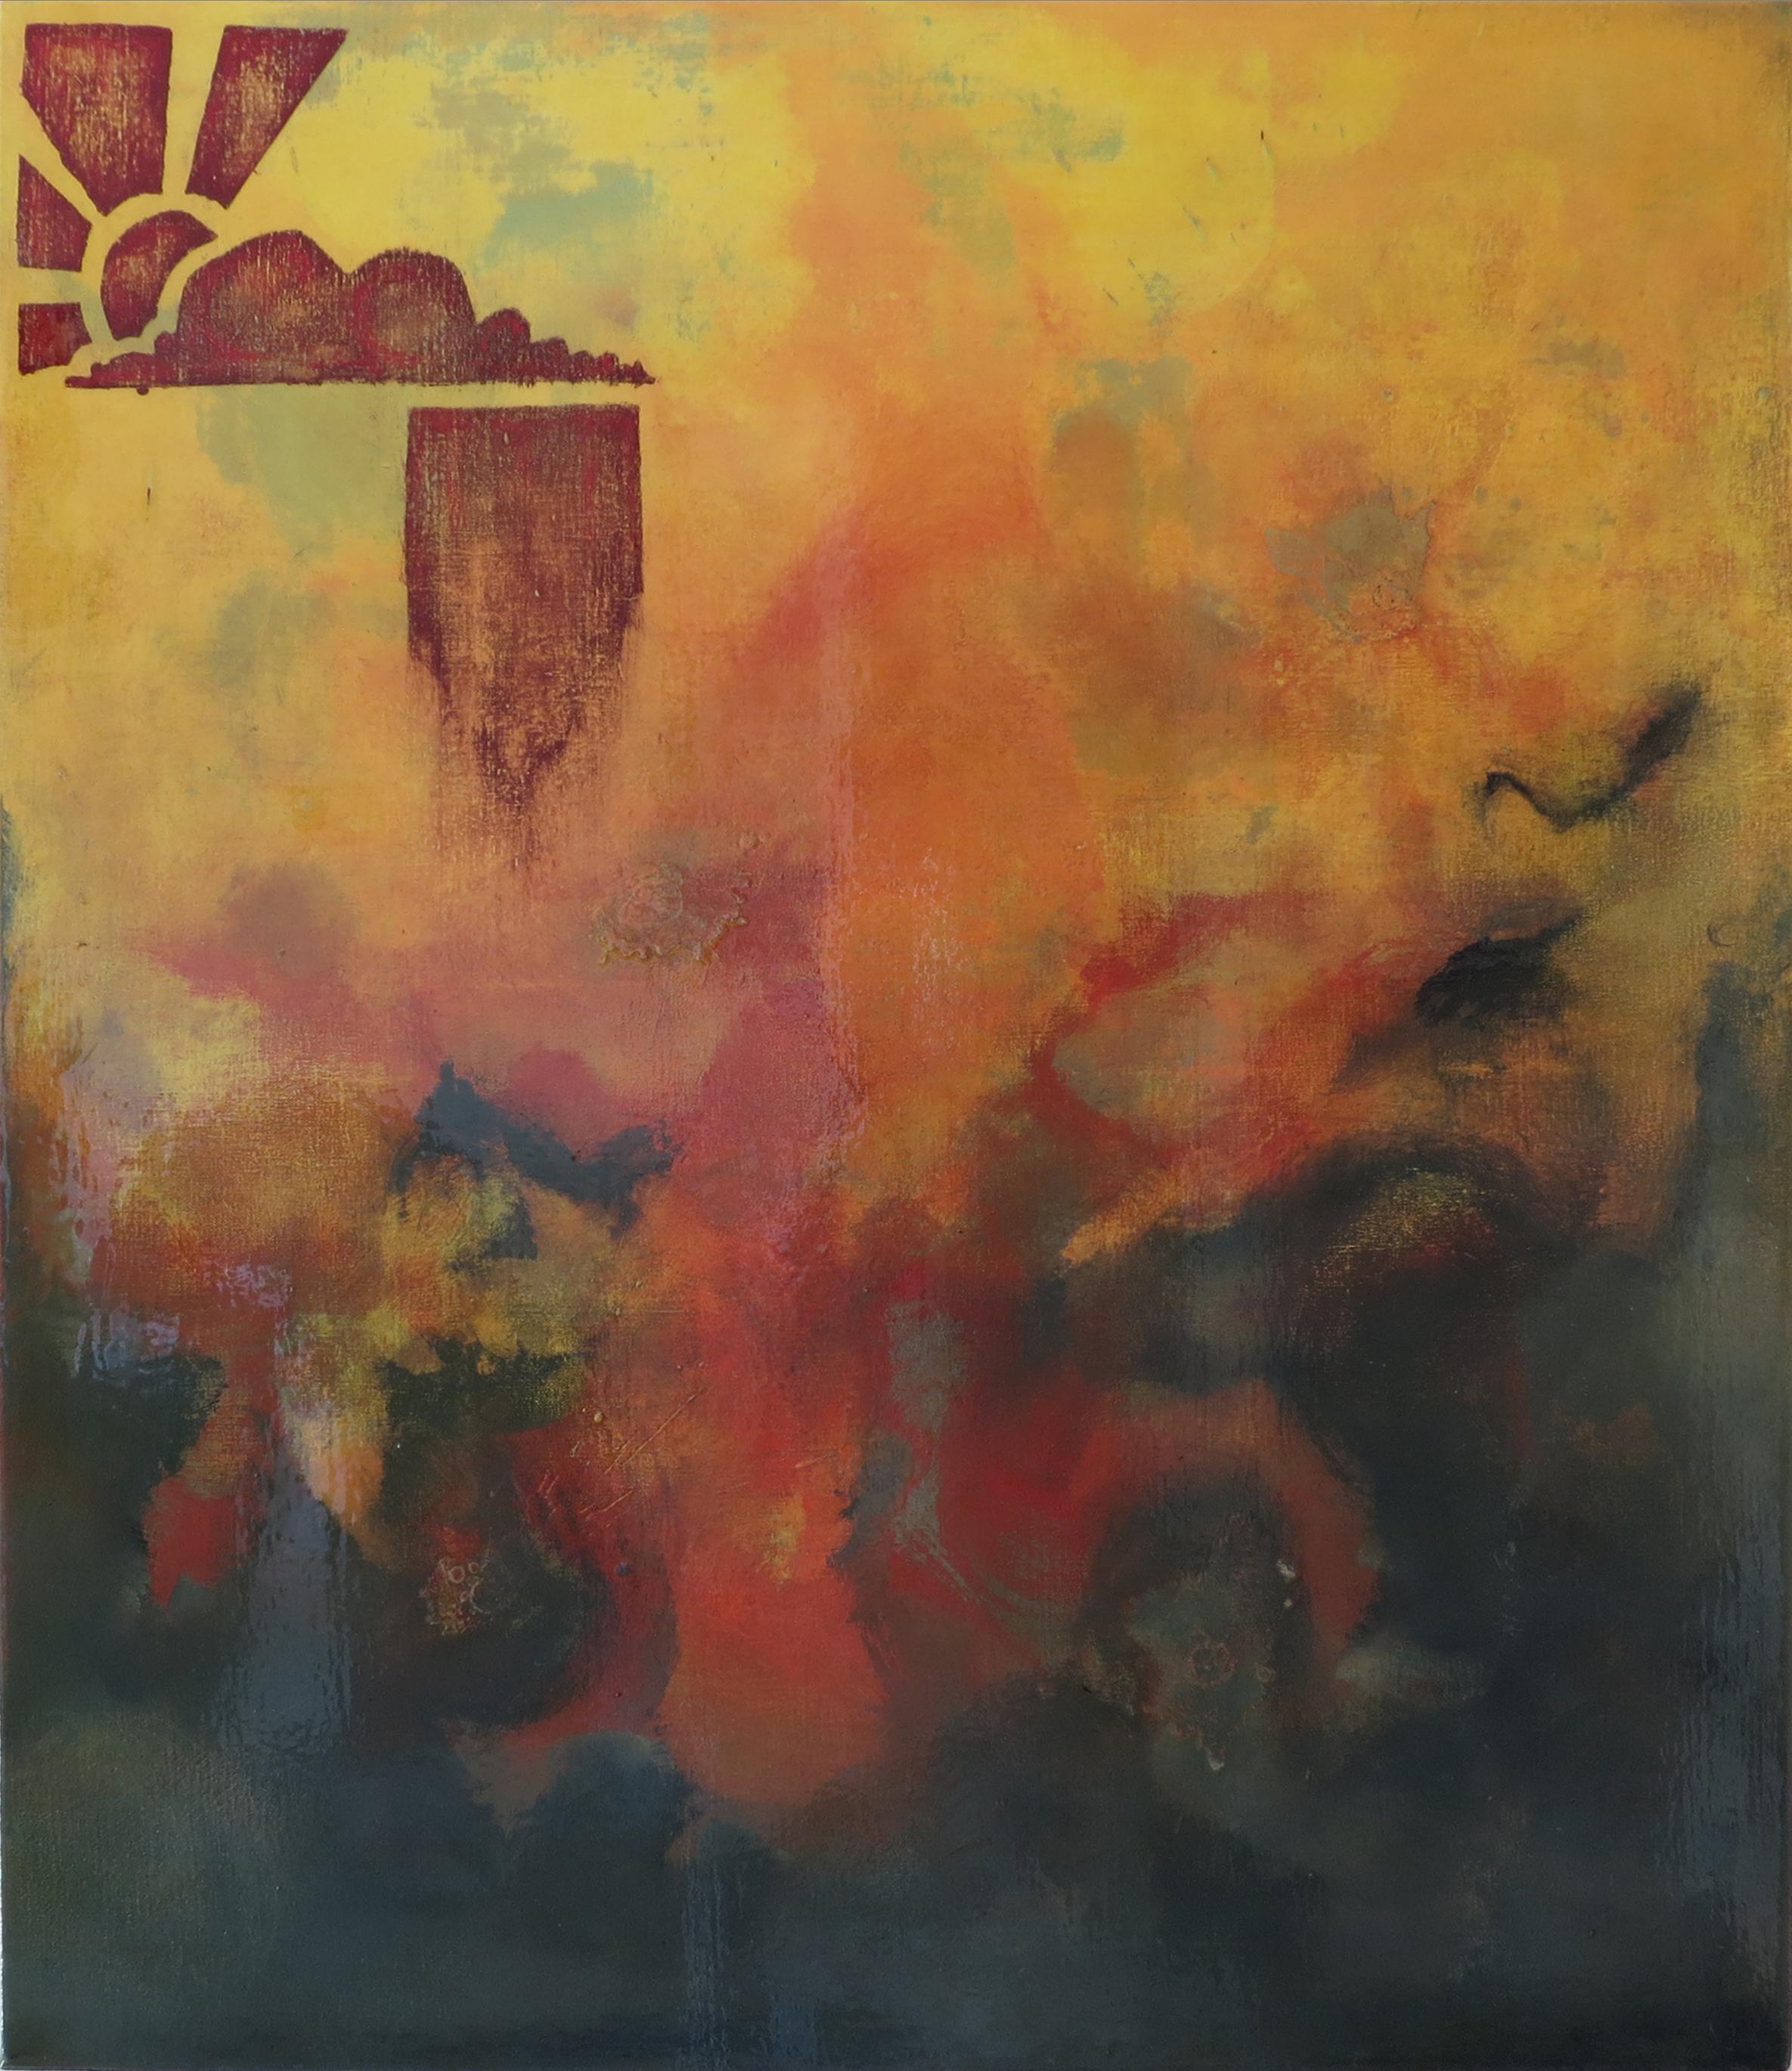 "STORM   2013  Series: Peace Hill  Acrylic, Wax, Varnish on Canvas  36x40"""